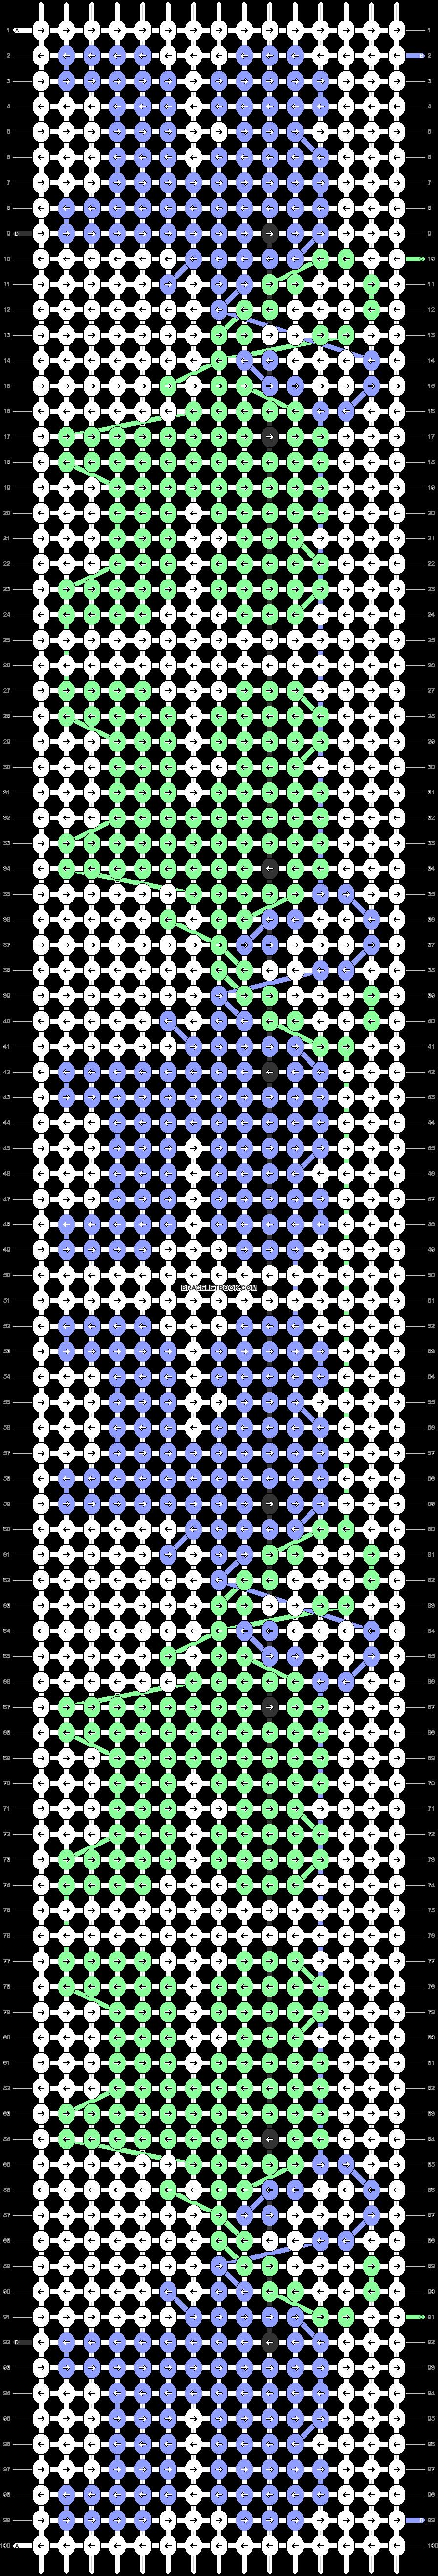 Alpha pattern #11456 variation #20092 pattern